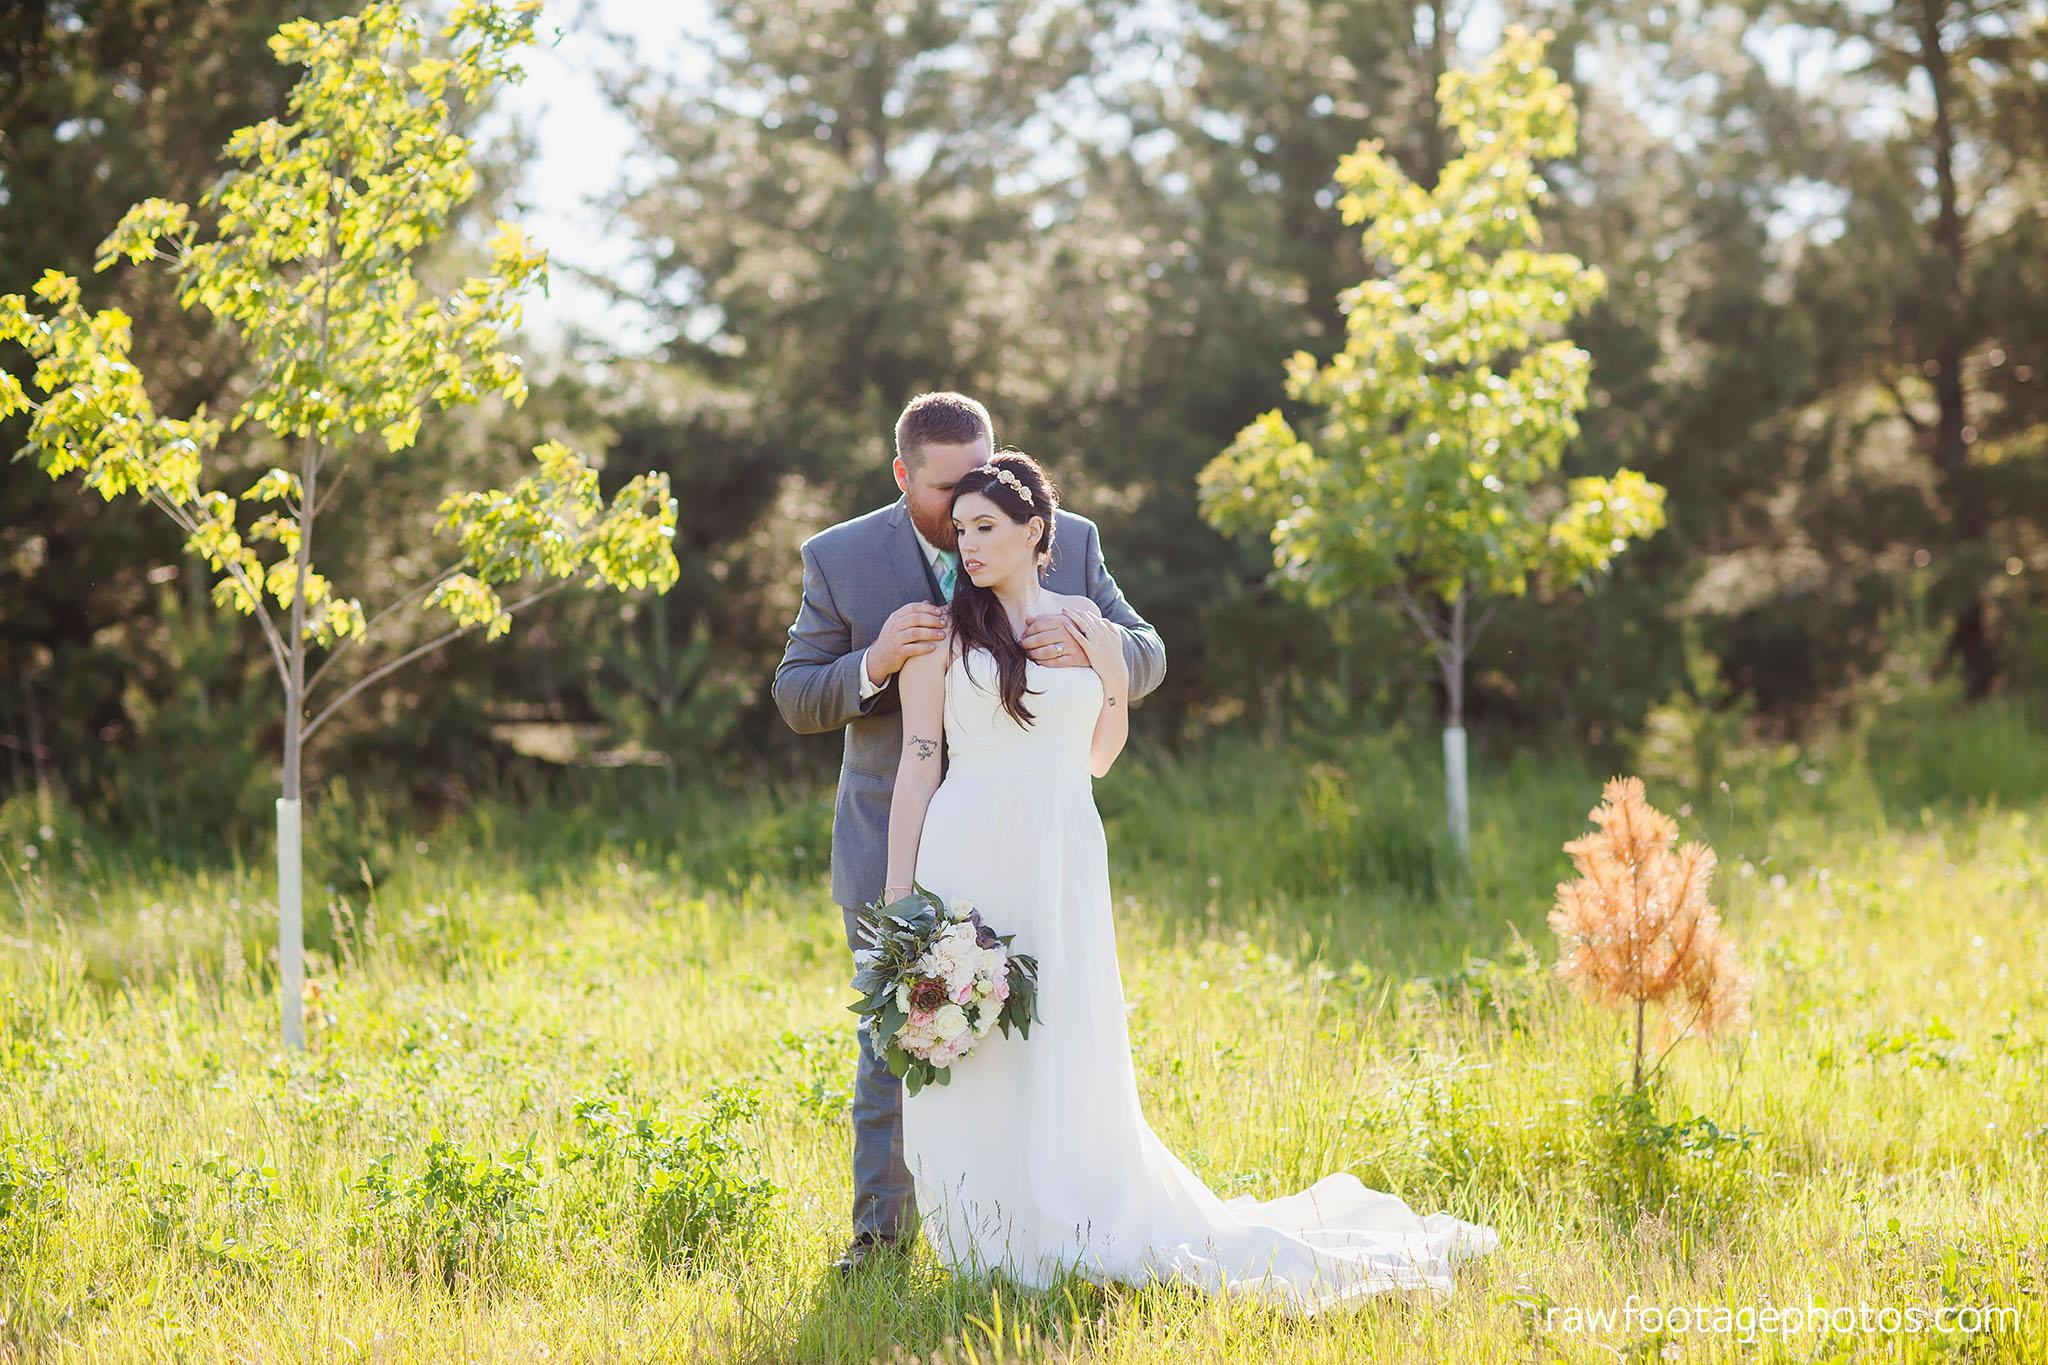 london_ontario_wedding_photographer-century_wedding_barn-raw_footage_photography-diy_wedding078.jpg